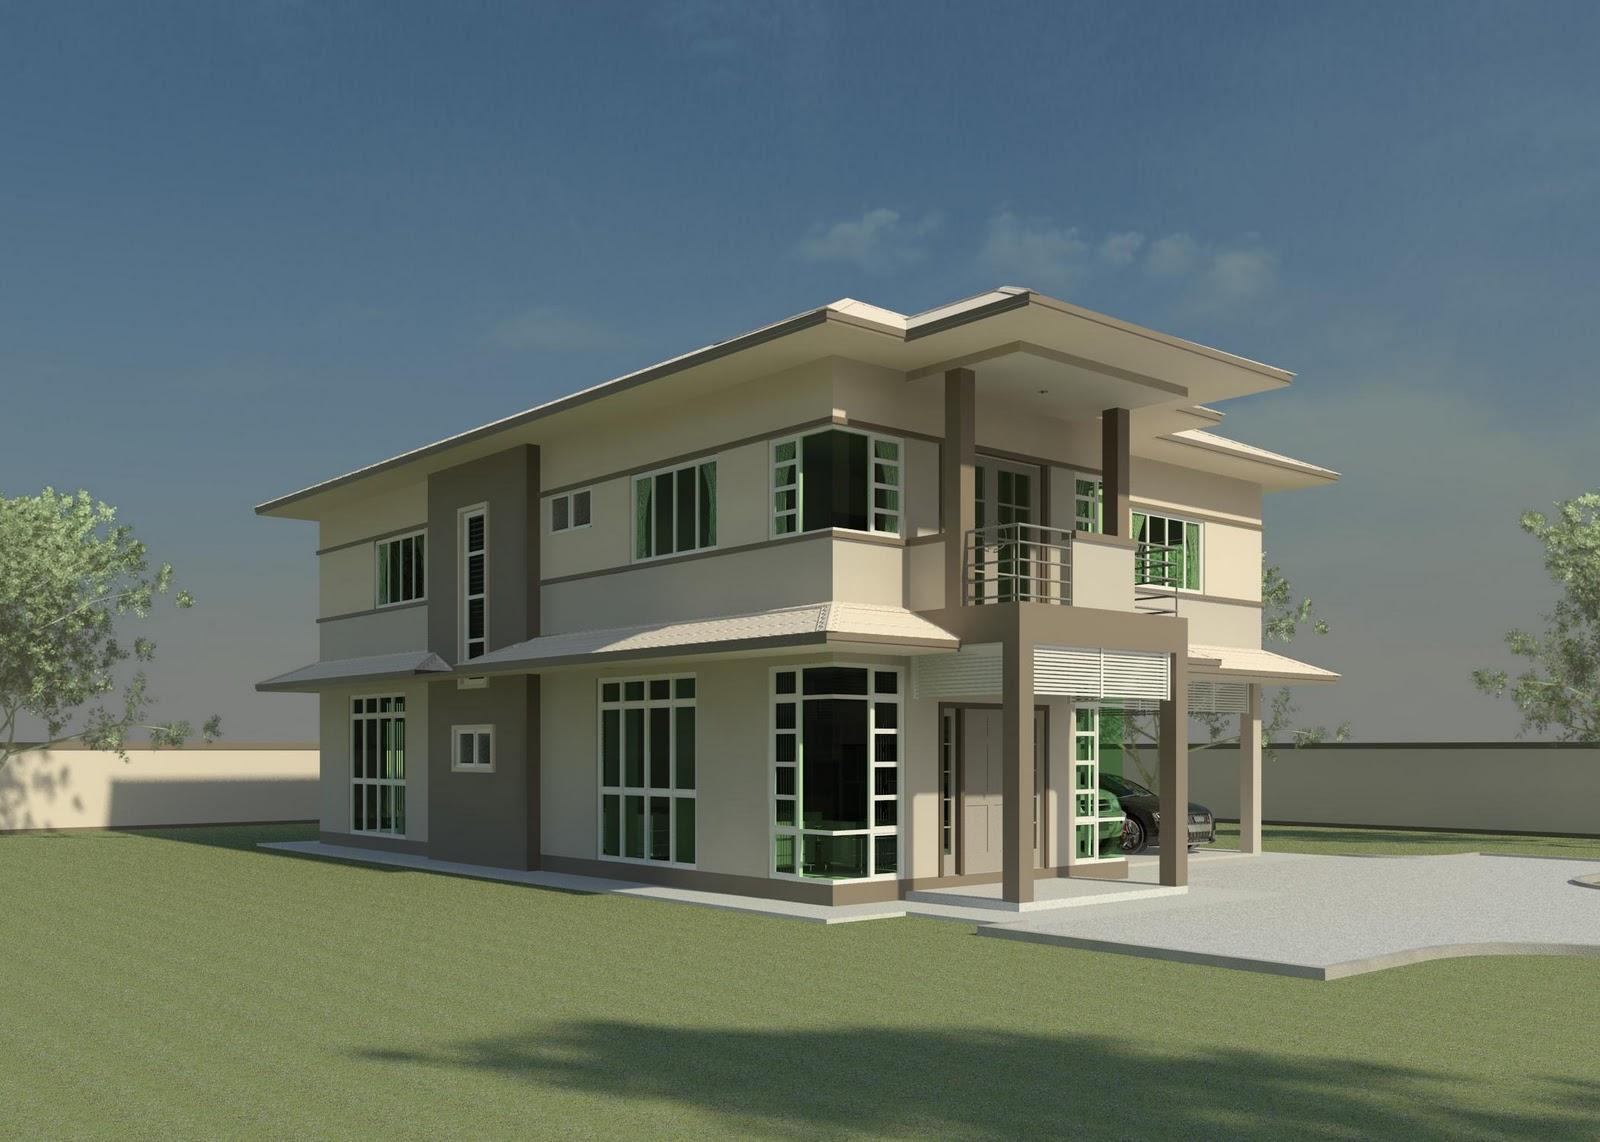 Khalid rahman design 5 bedrooms 6 bathrooms double for 5 story house